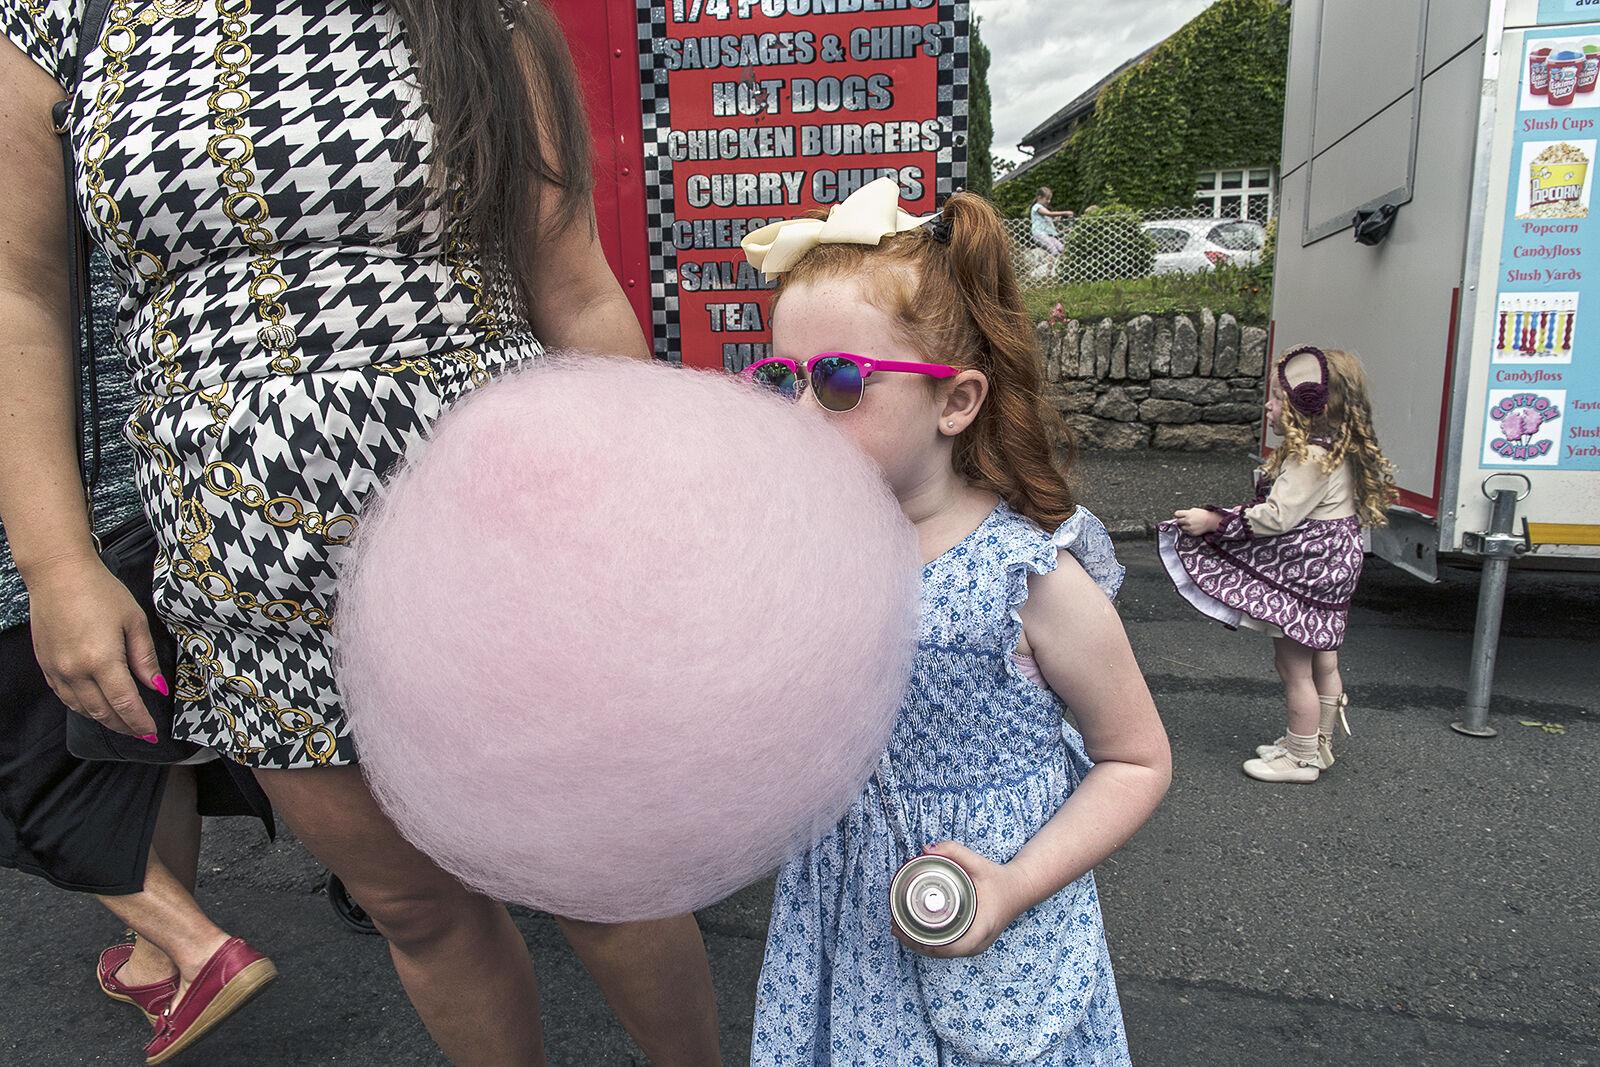 Pink Cotton Candy, Borris Fair, Carlow, Ireland 2019